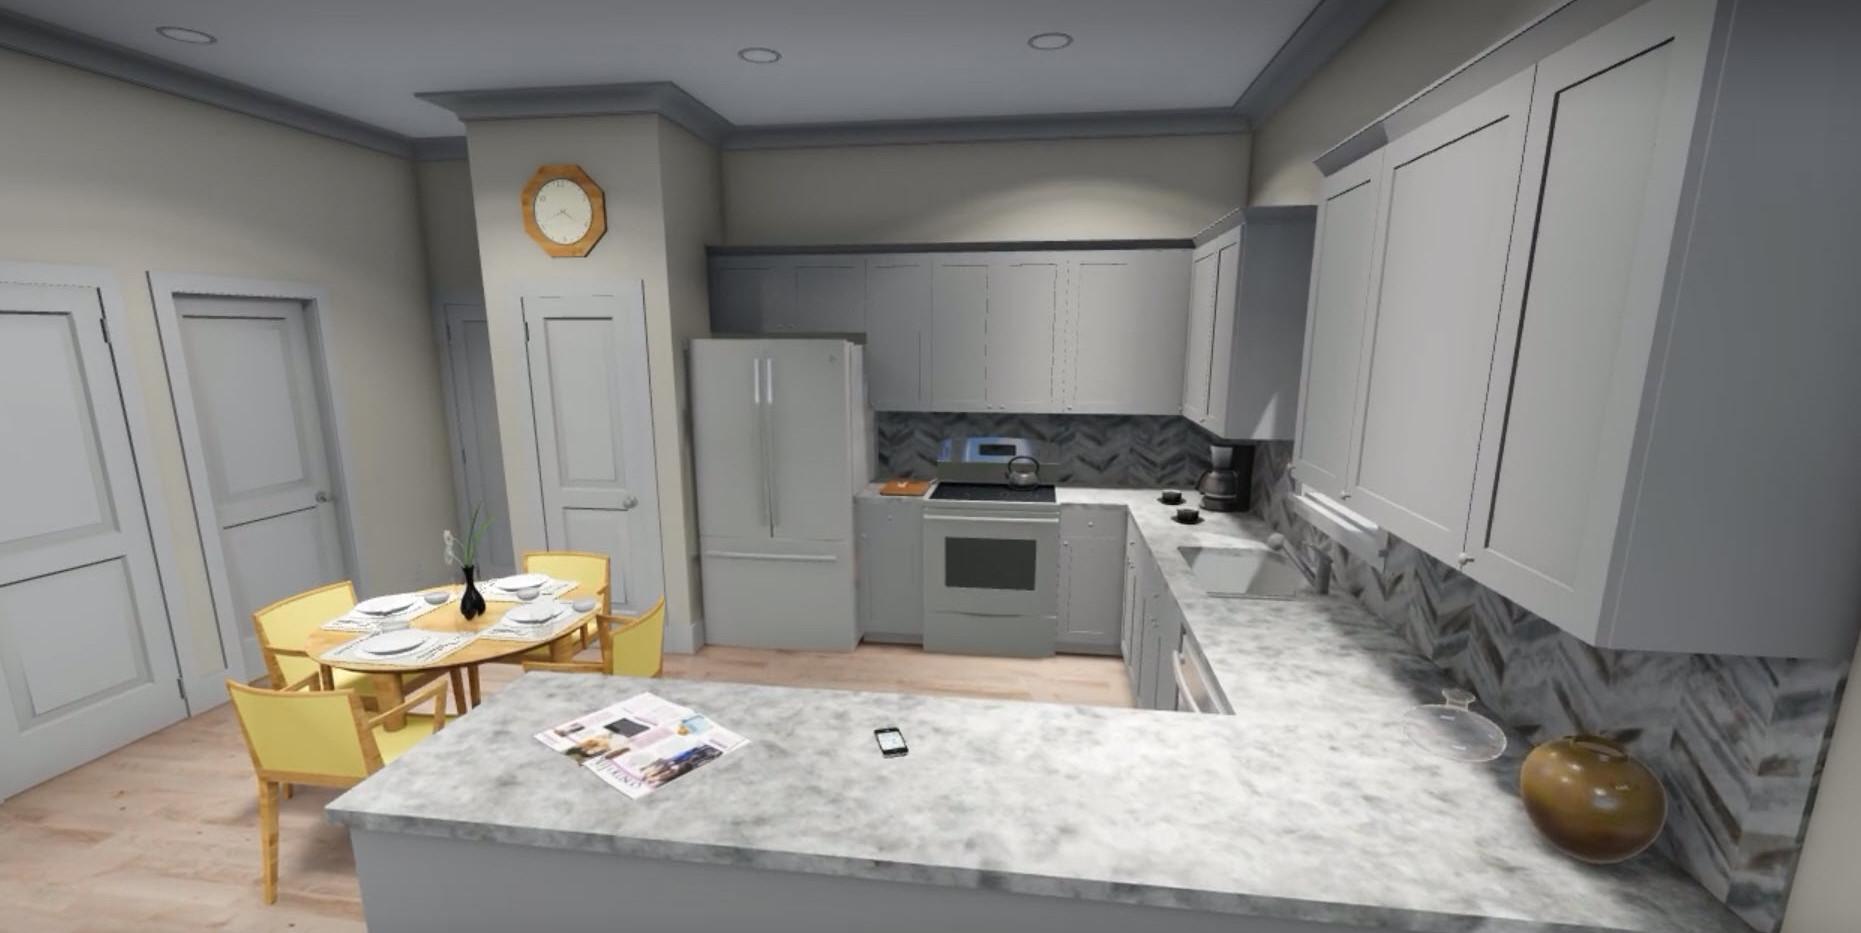 Modern Interior - 3.jpg